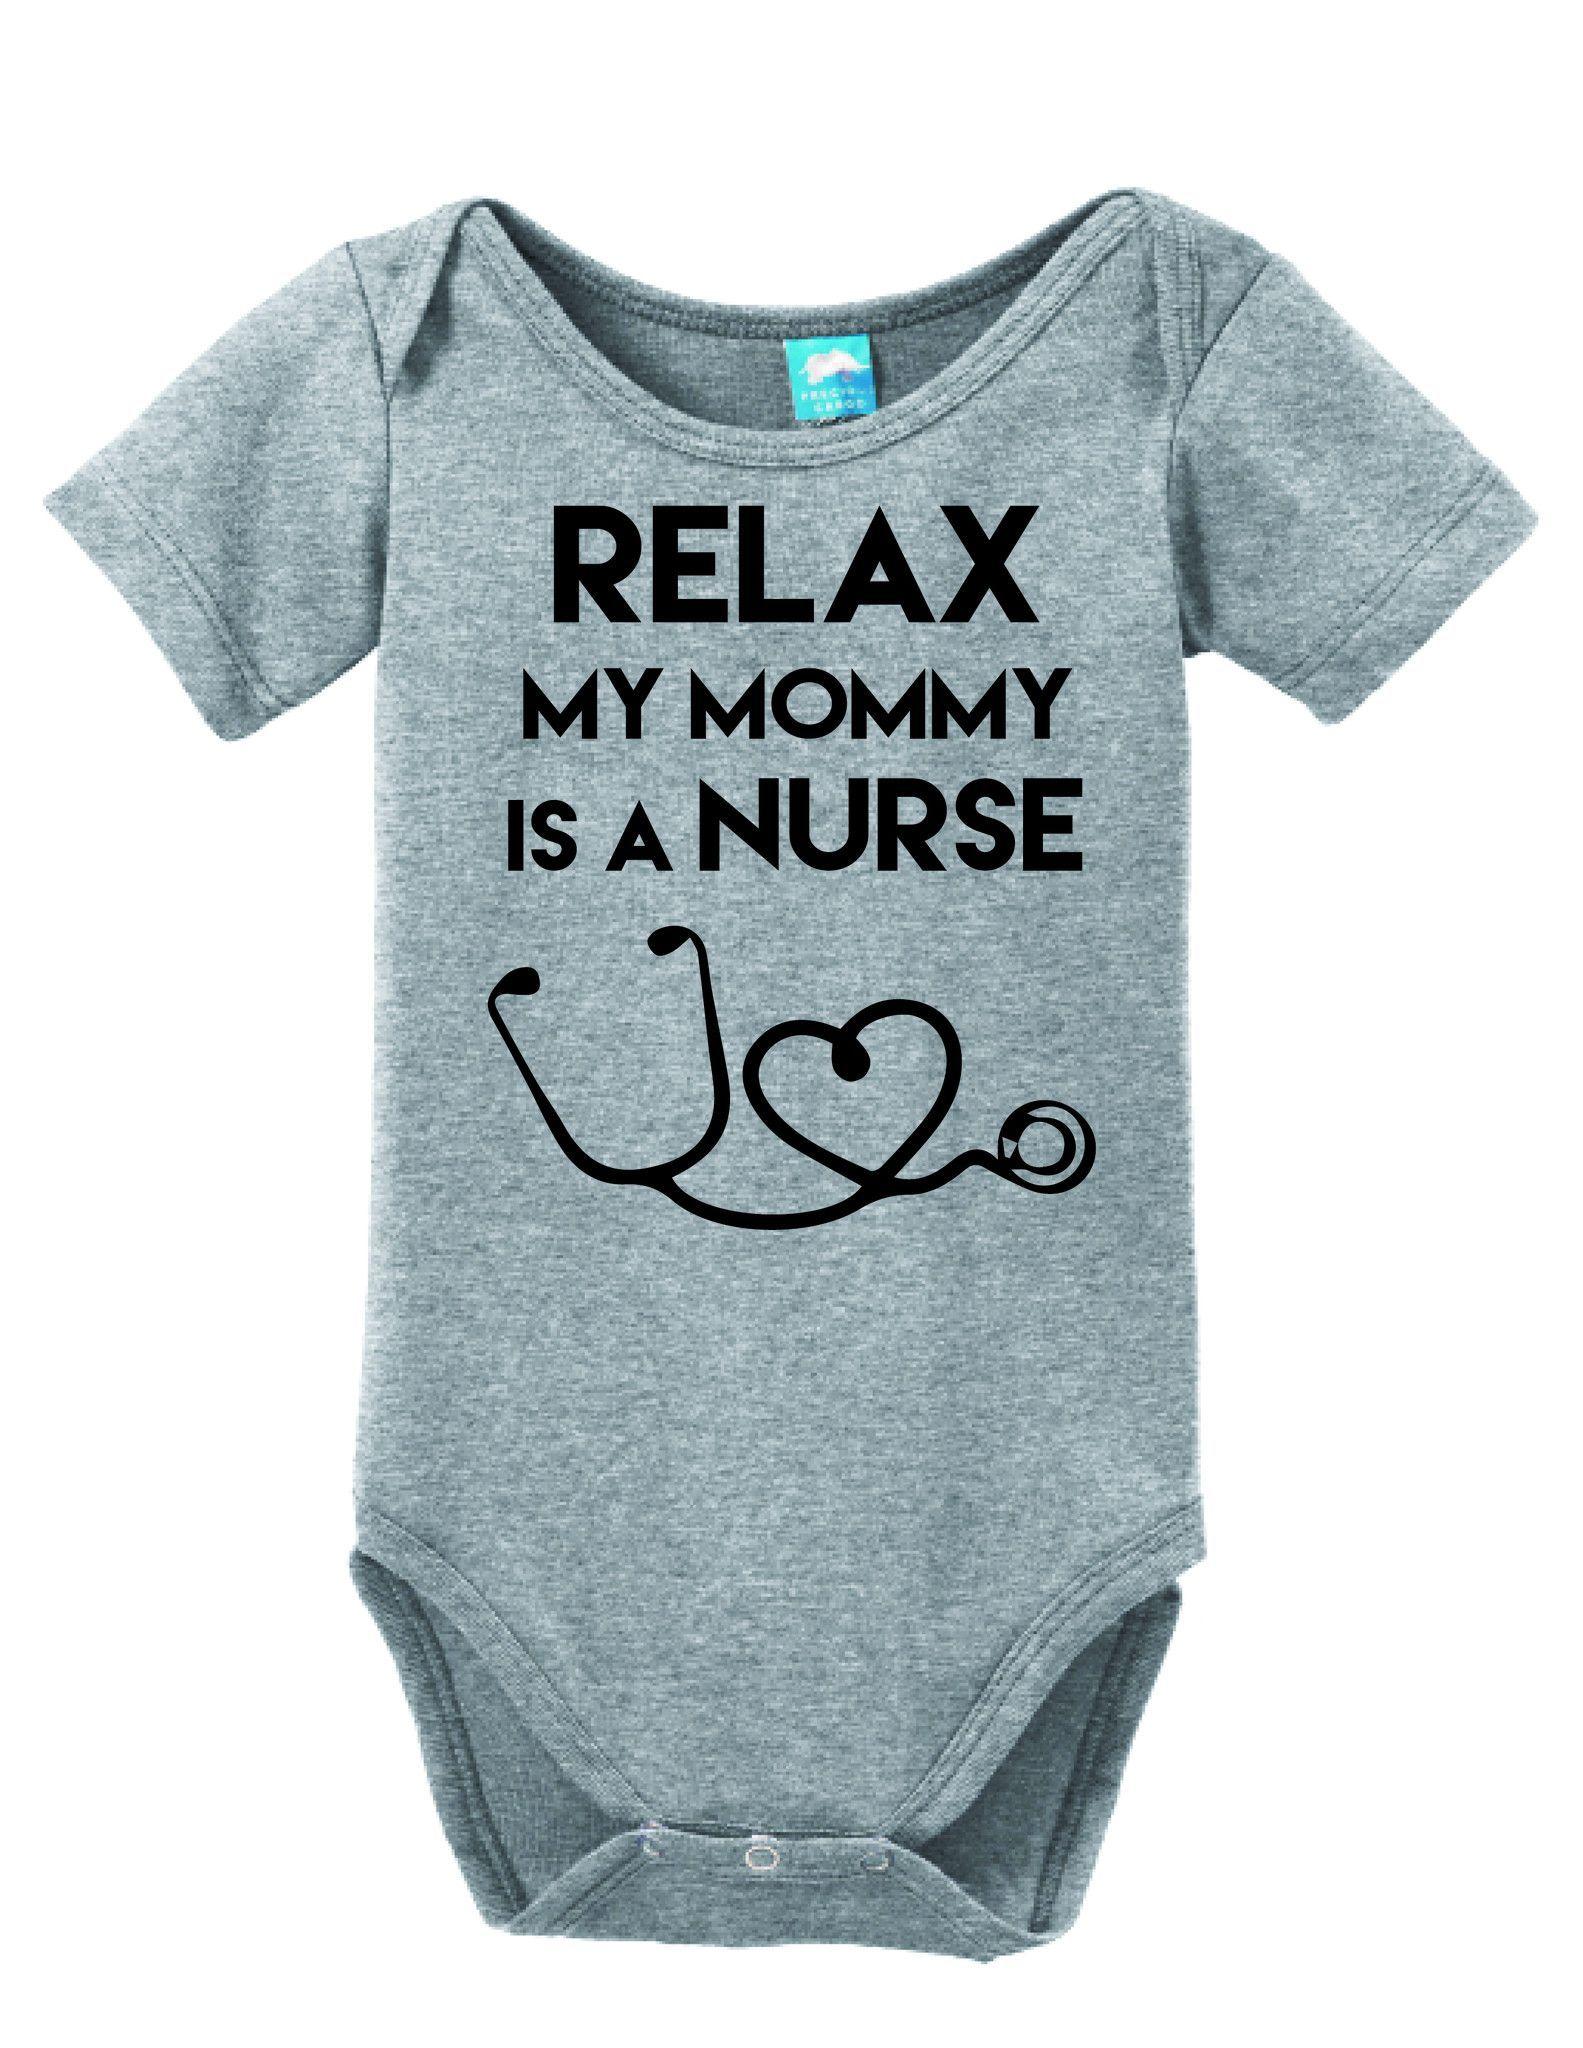 Relax My Mommy Is a Nurse Onesie Funny Bodysuit Baby Romper